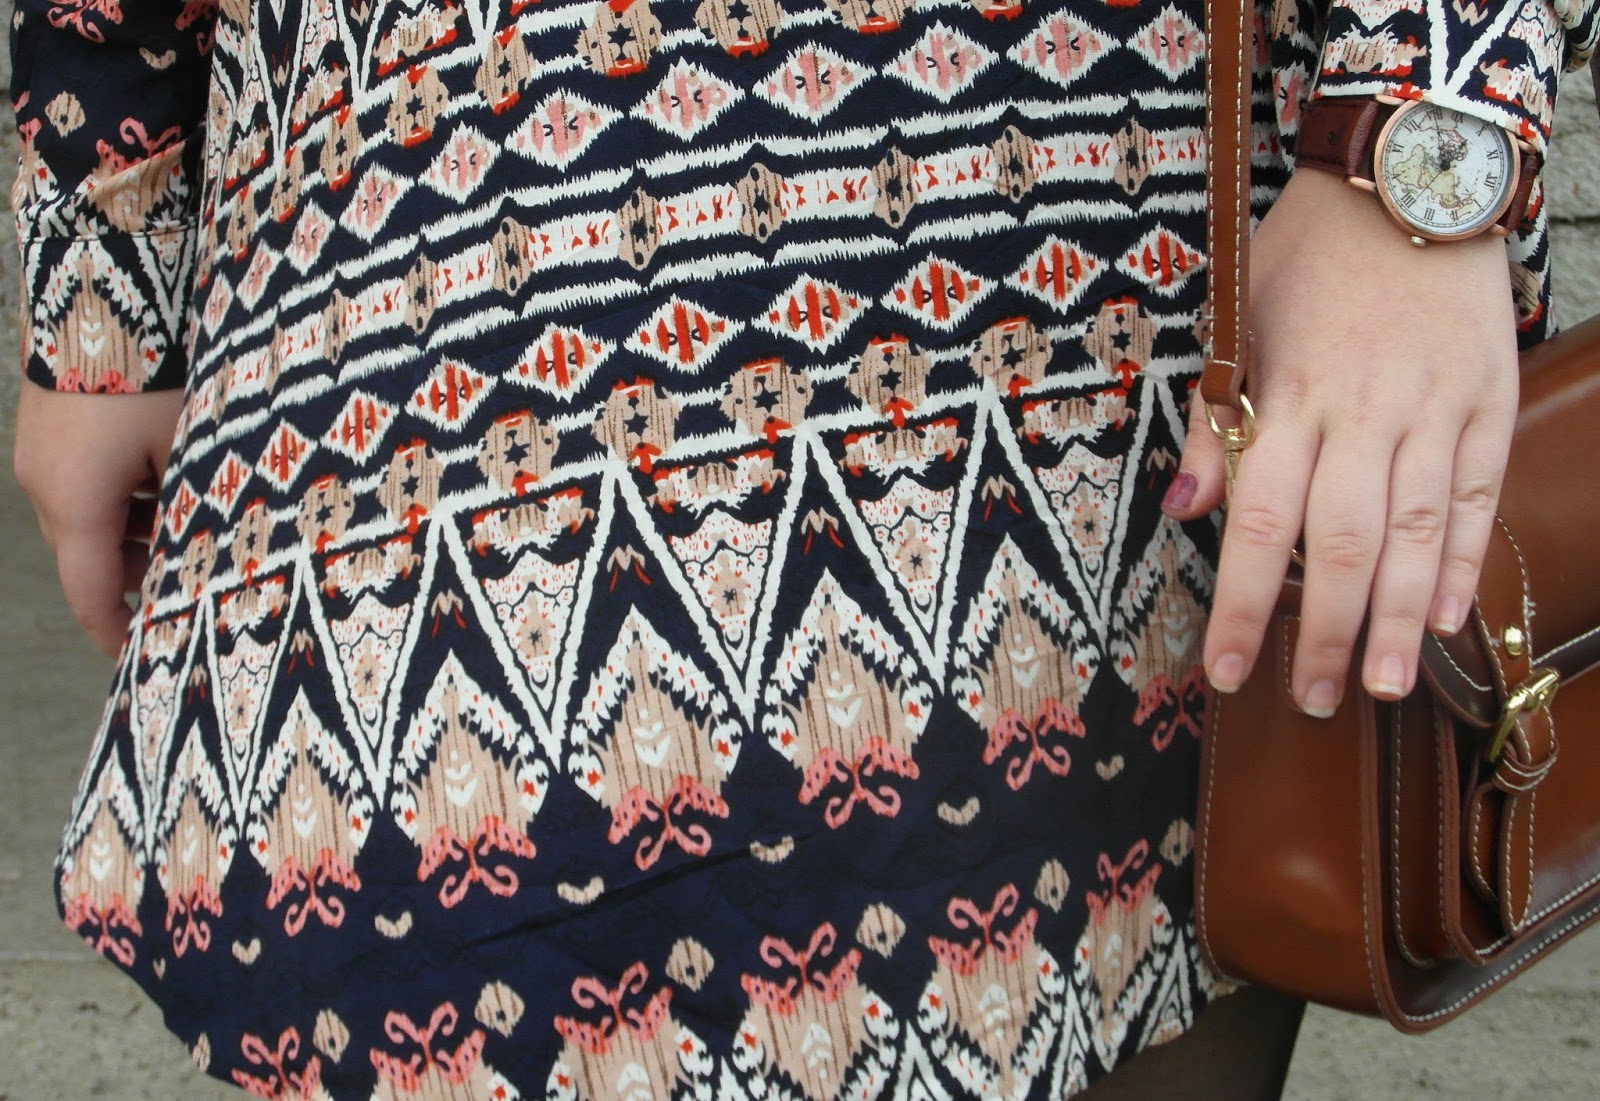 OOTD #1 [Autumn Geometric Dress]